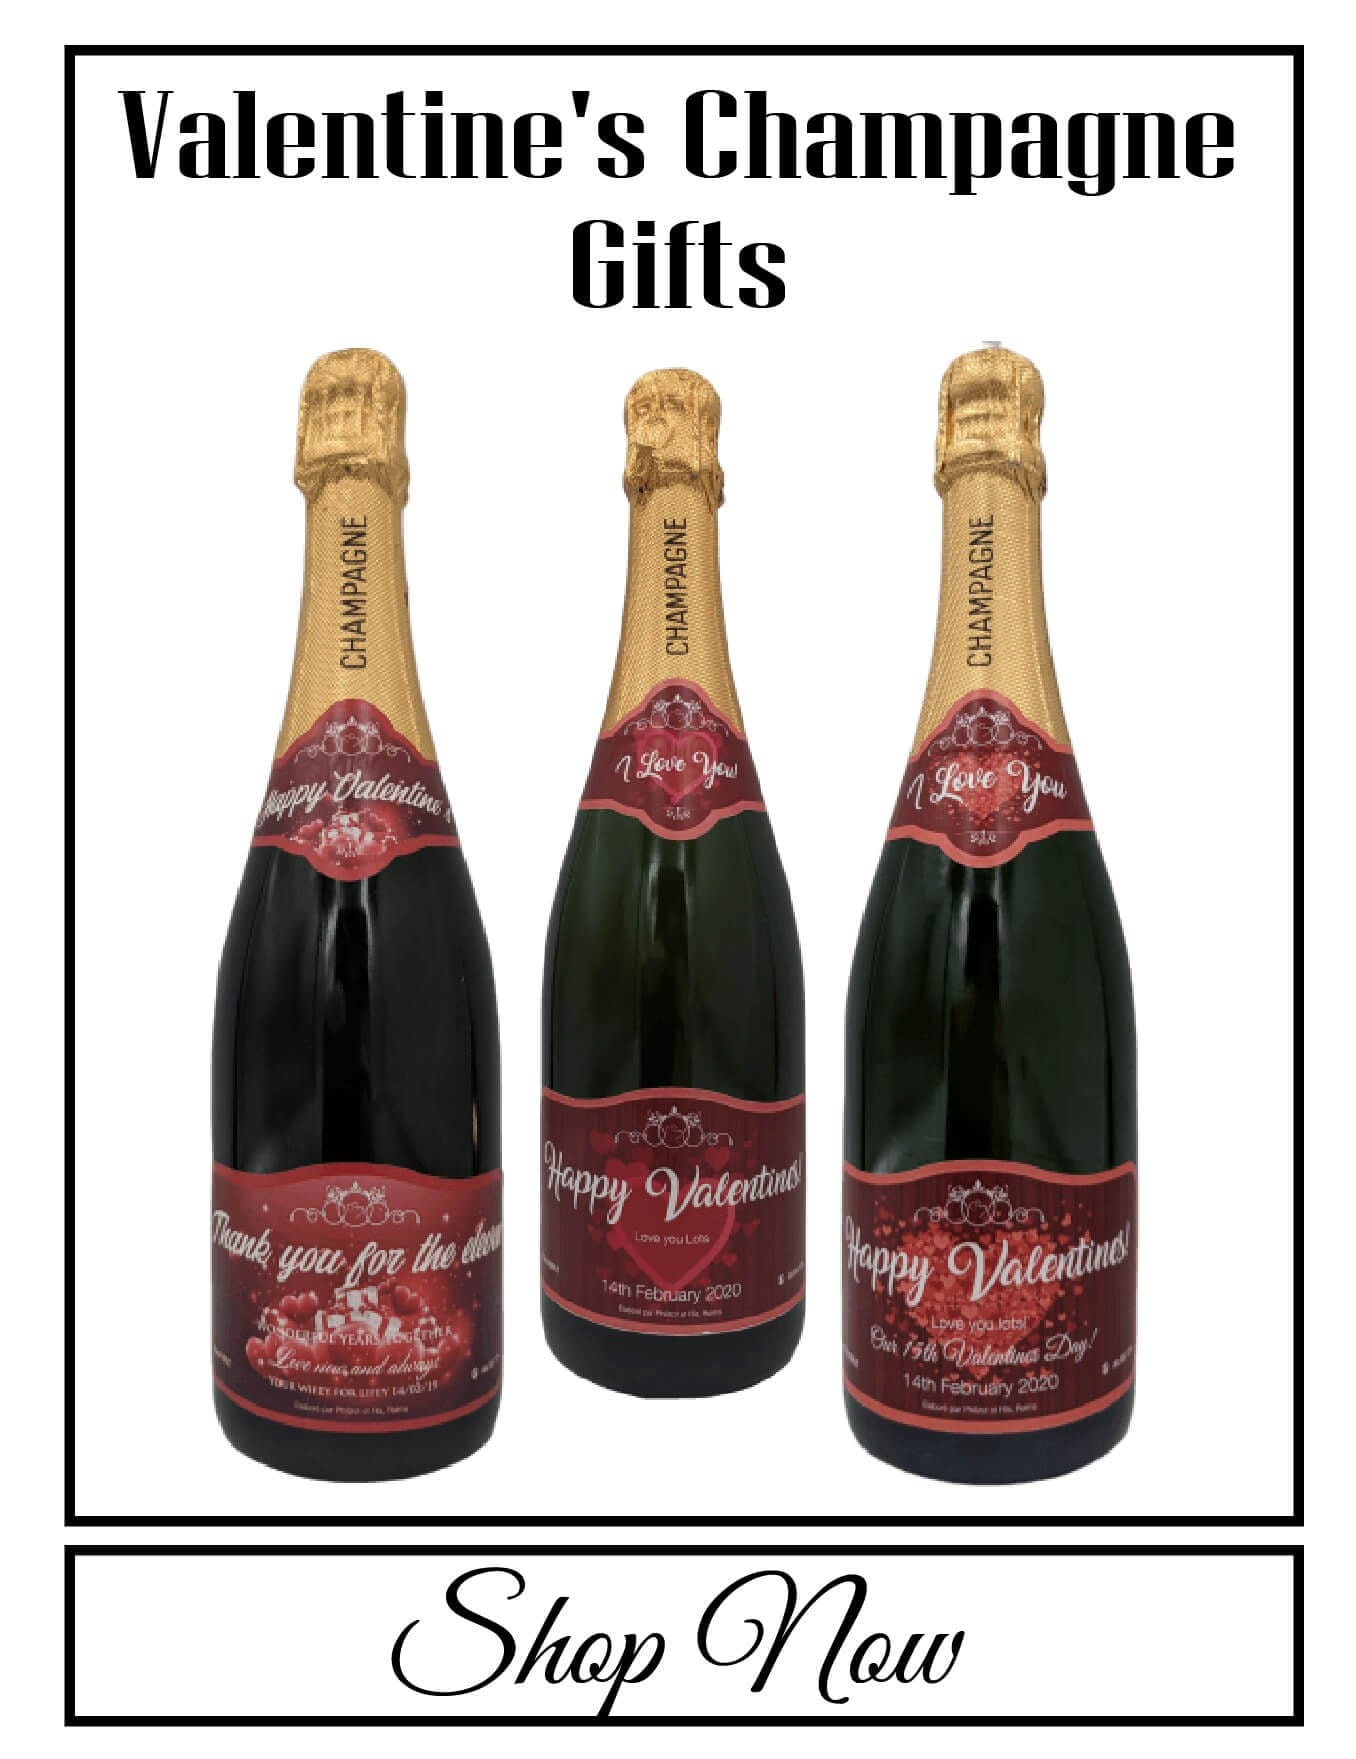 personalised Champagne customised bottle label delivery uk sparkling wine Valentine's love gift present bespoke unique